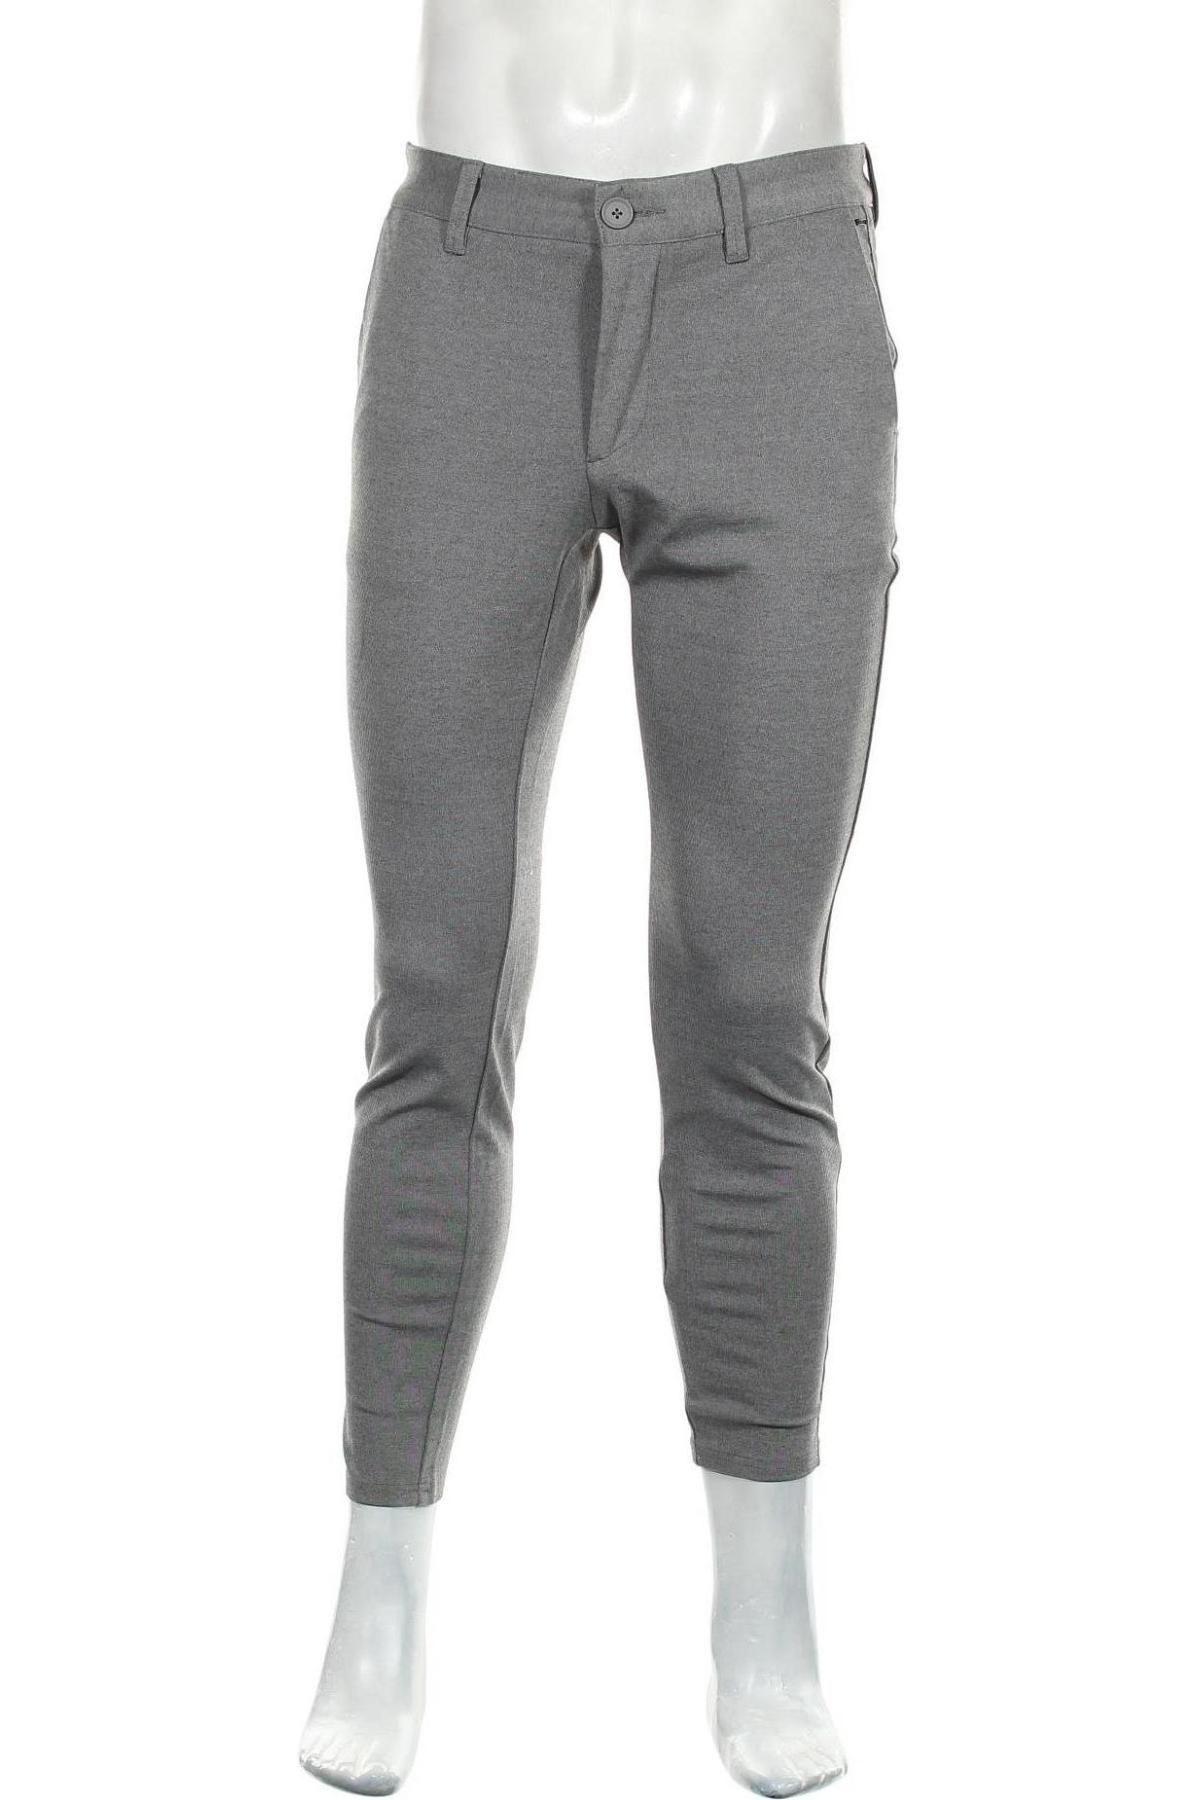 Мъжки панталон Only & Sons, Размер S, Цвят Сив, 64% вискоза, 31% полиестер, 5% еластан, Цена 26,55лв.